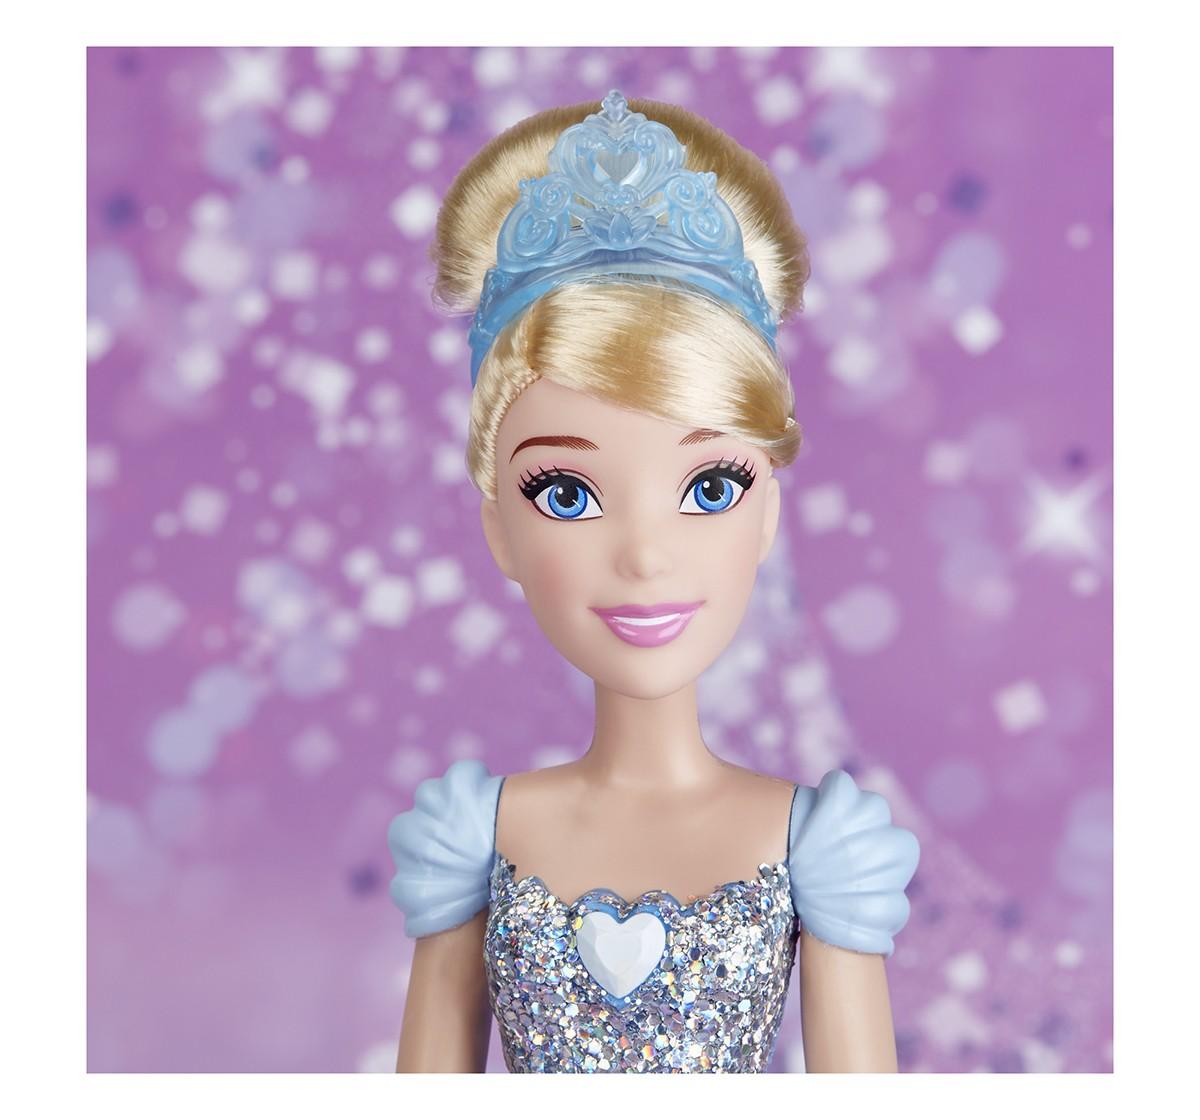 Disney Princess Royal Shimmer Cinderella Dolls & Accessories for Girls age 3Y+